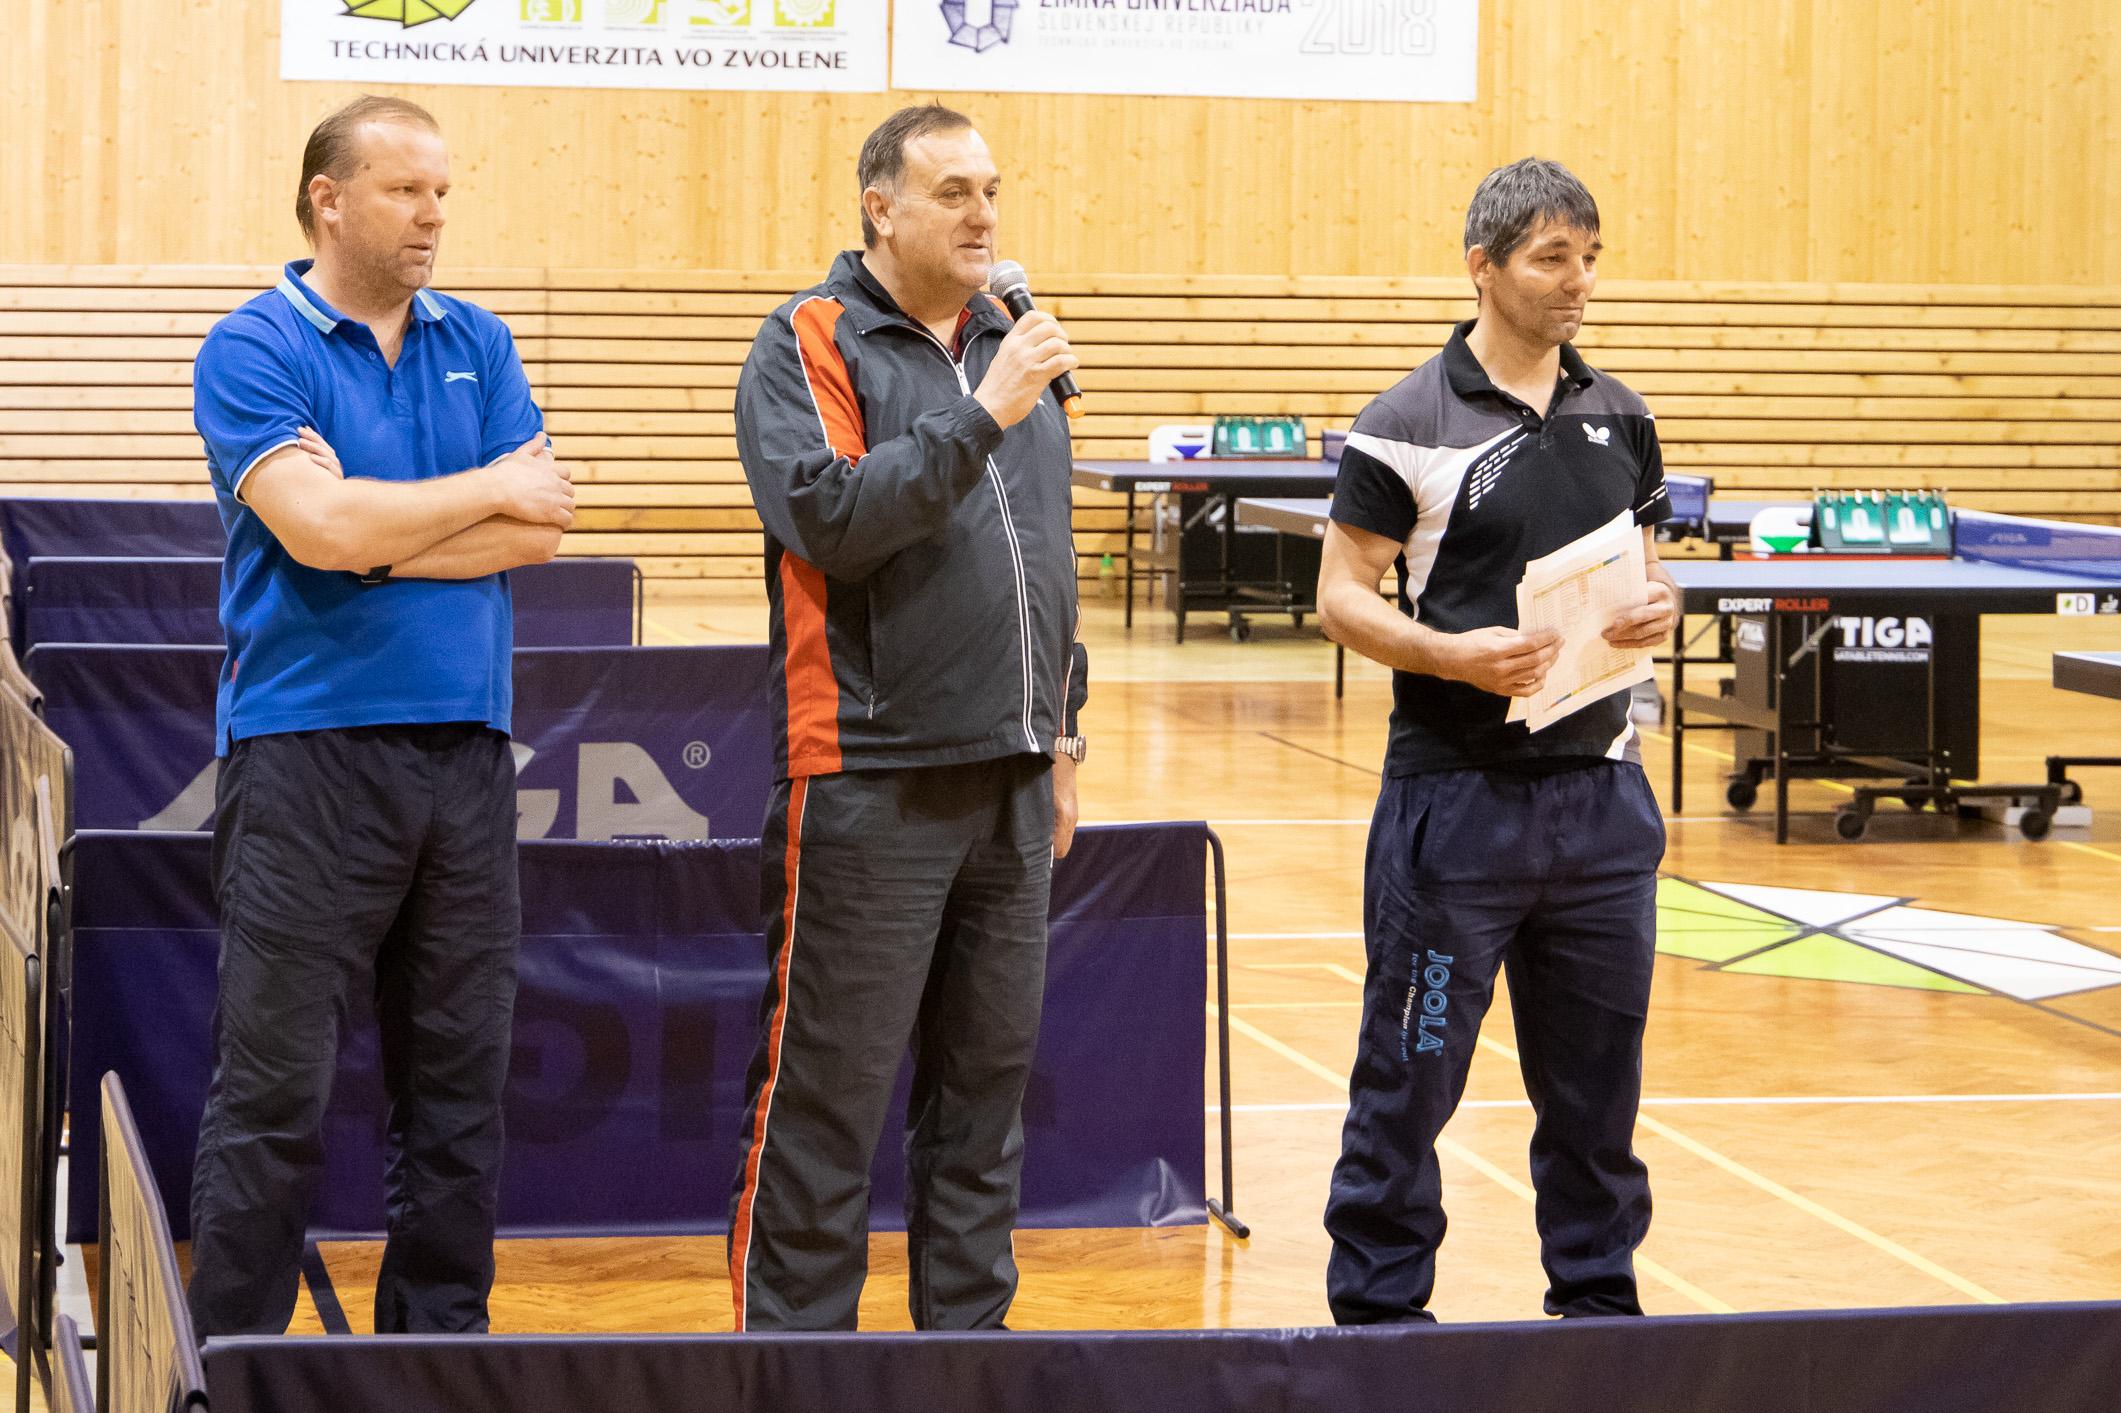 oblast-turnaj-mladeze-zv-dt-ka-3